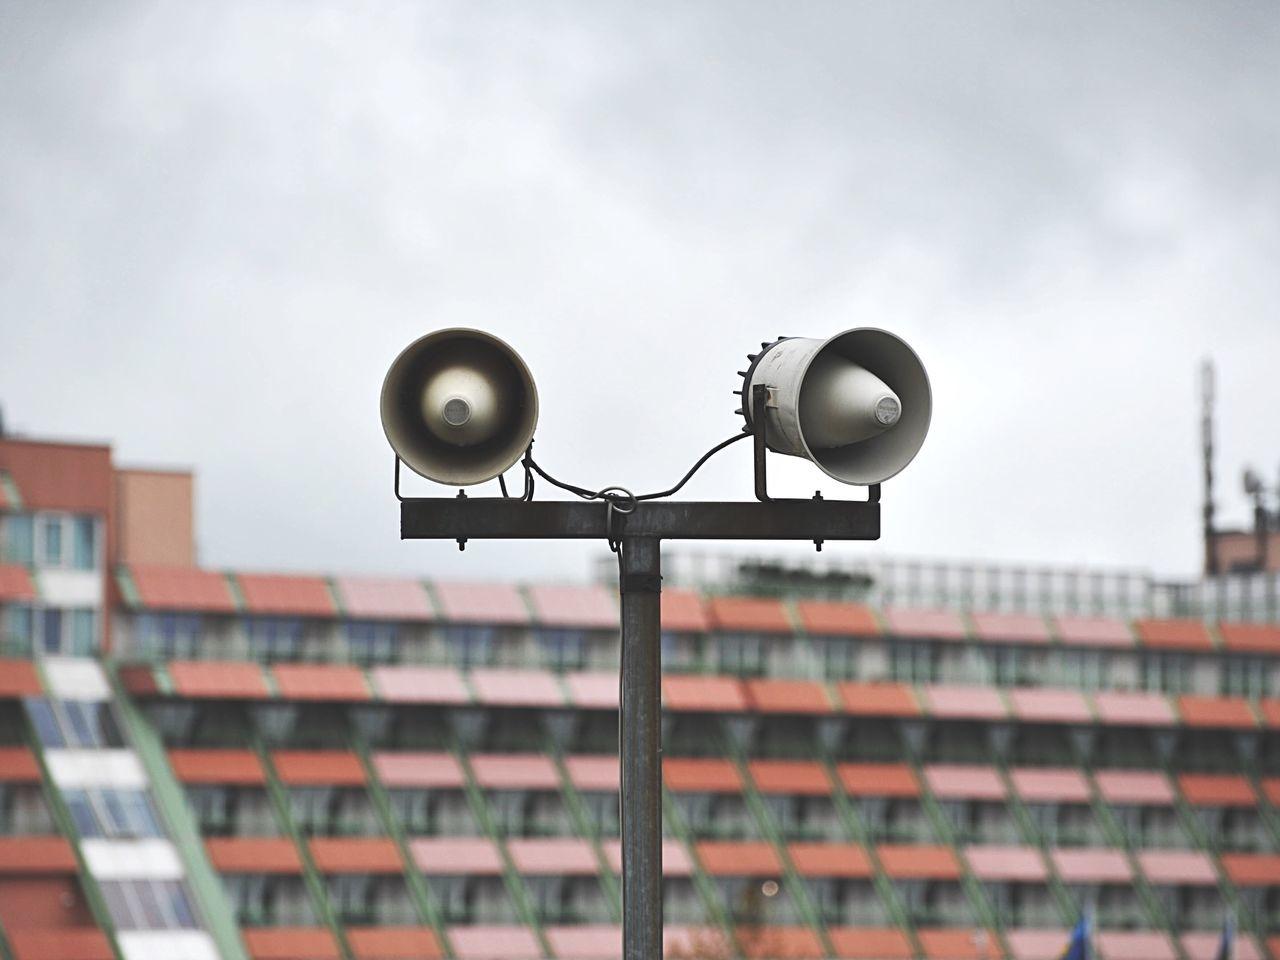 Close-up of loudspeaker at nurburgring